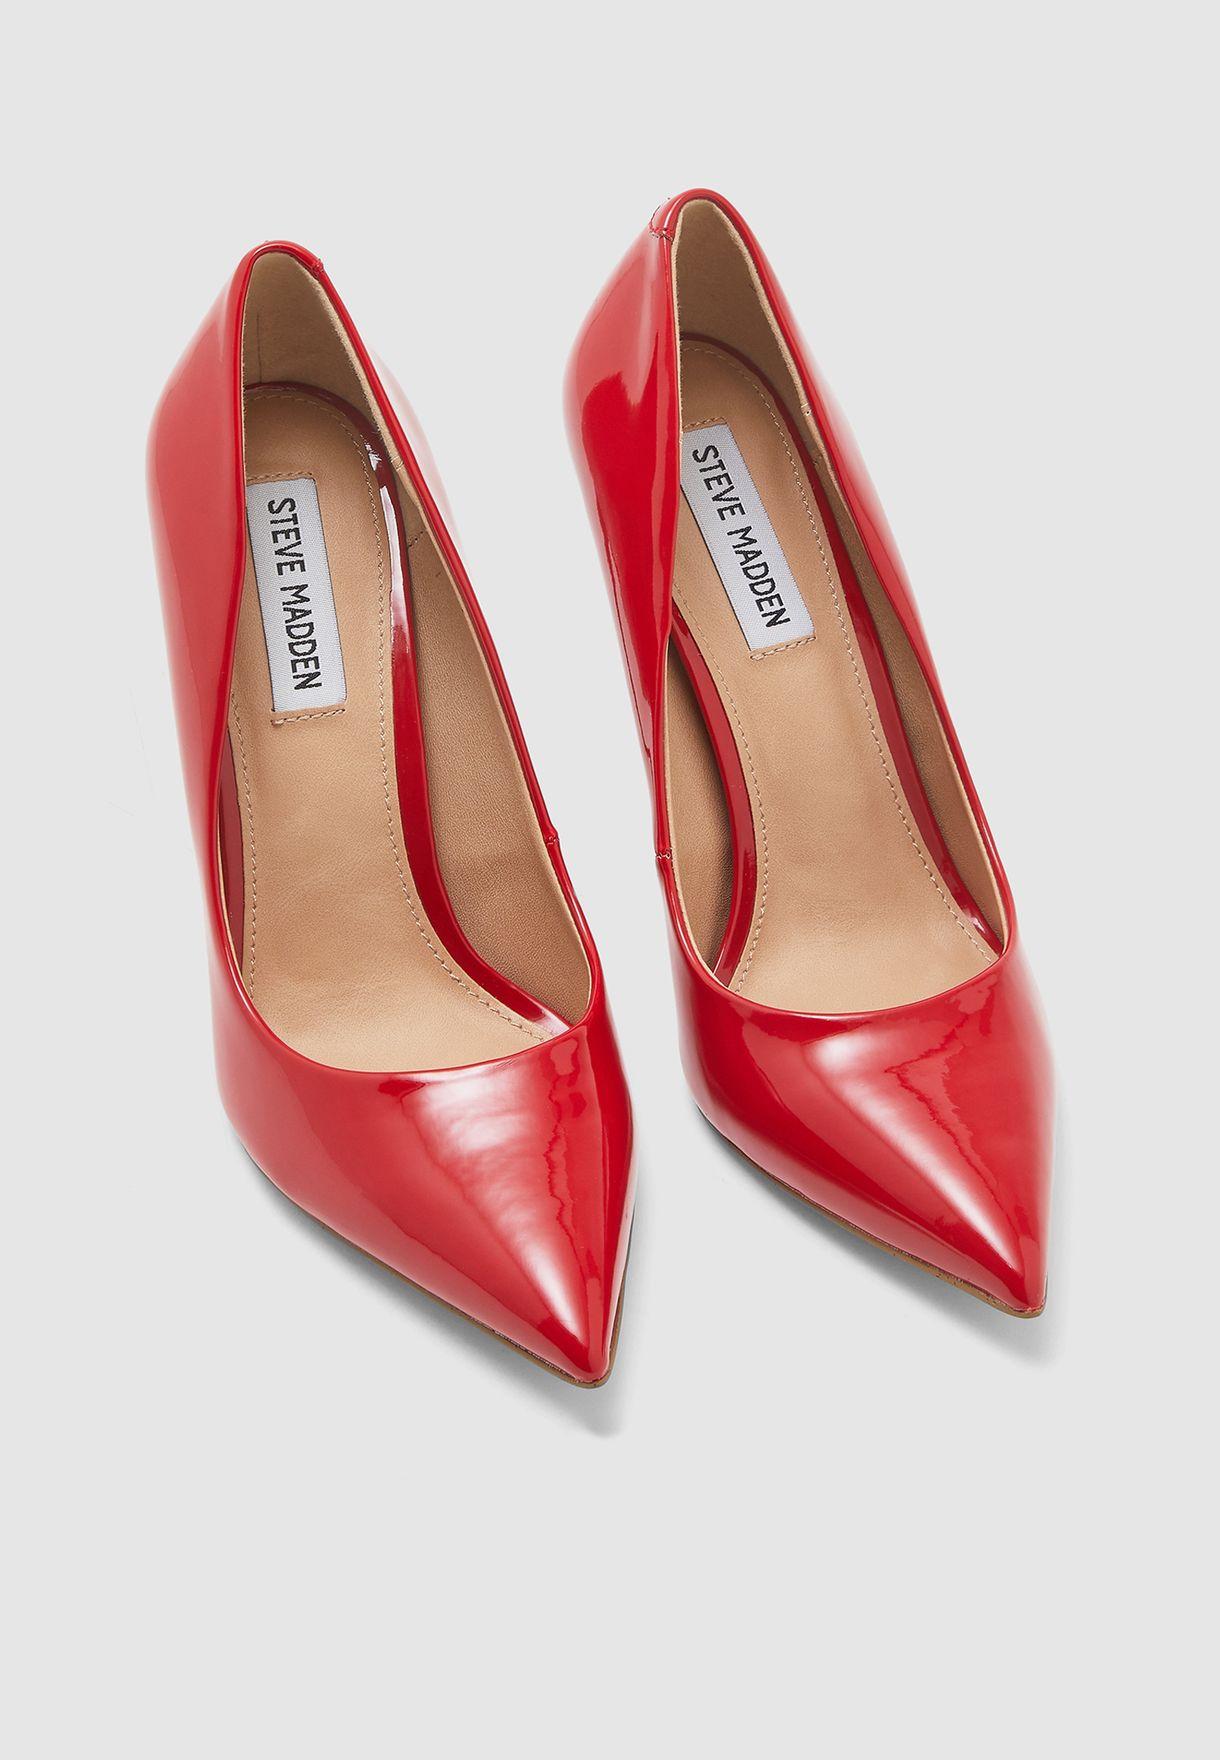 Vala High Heel Pump - Red